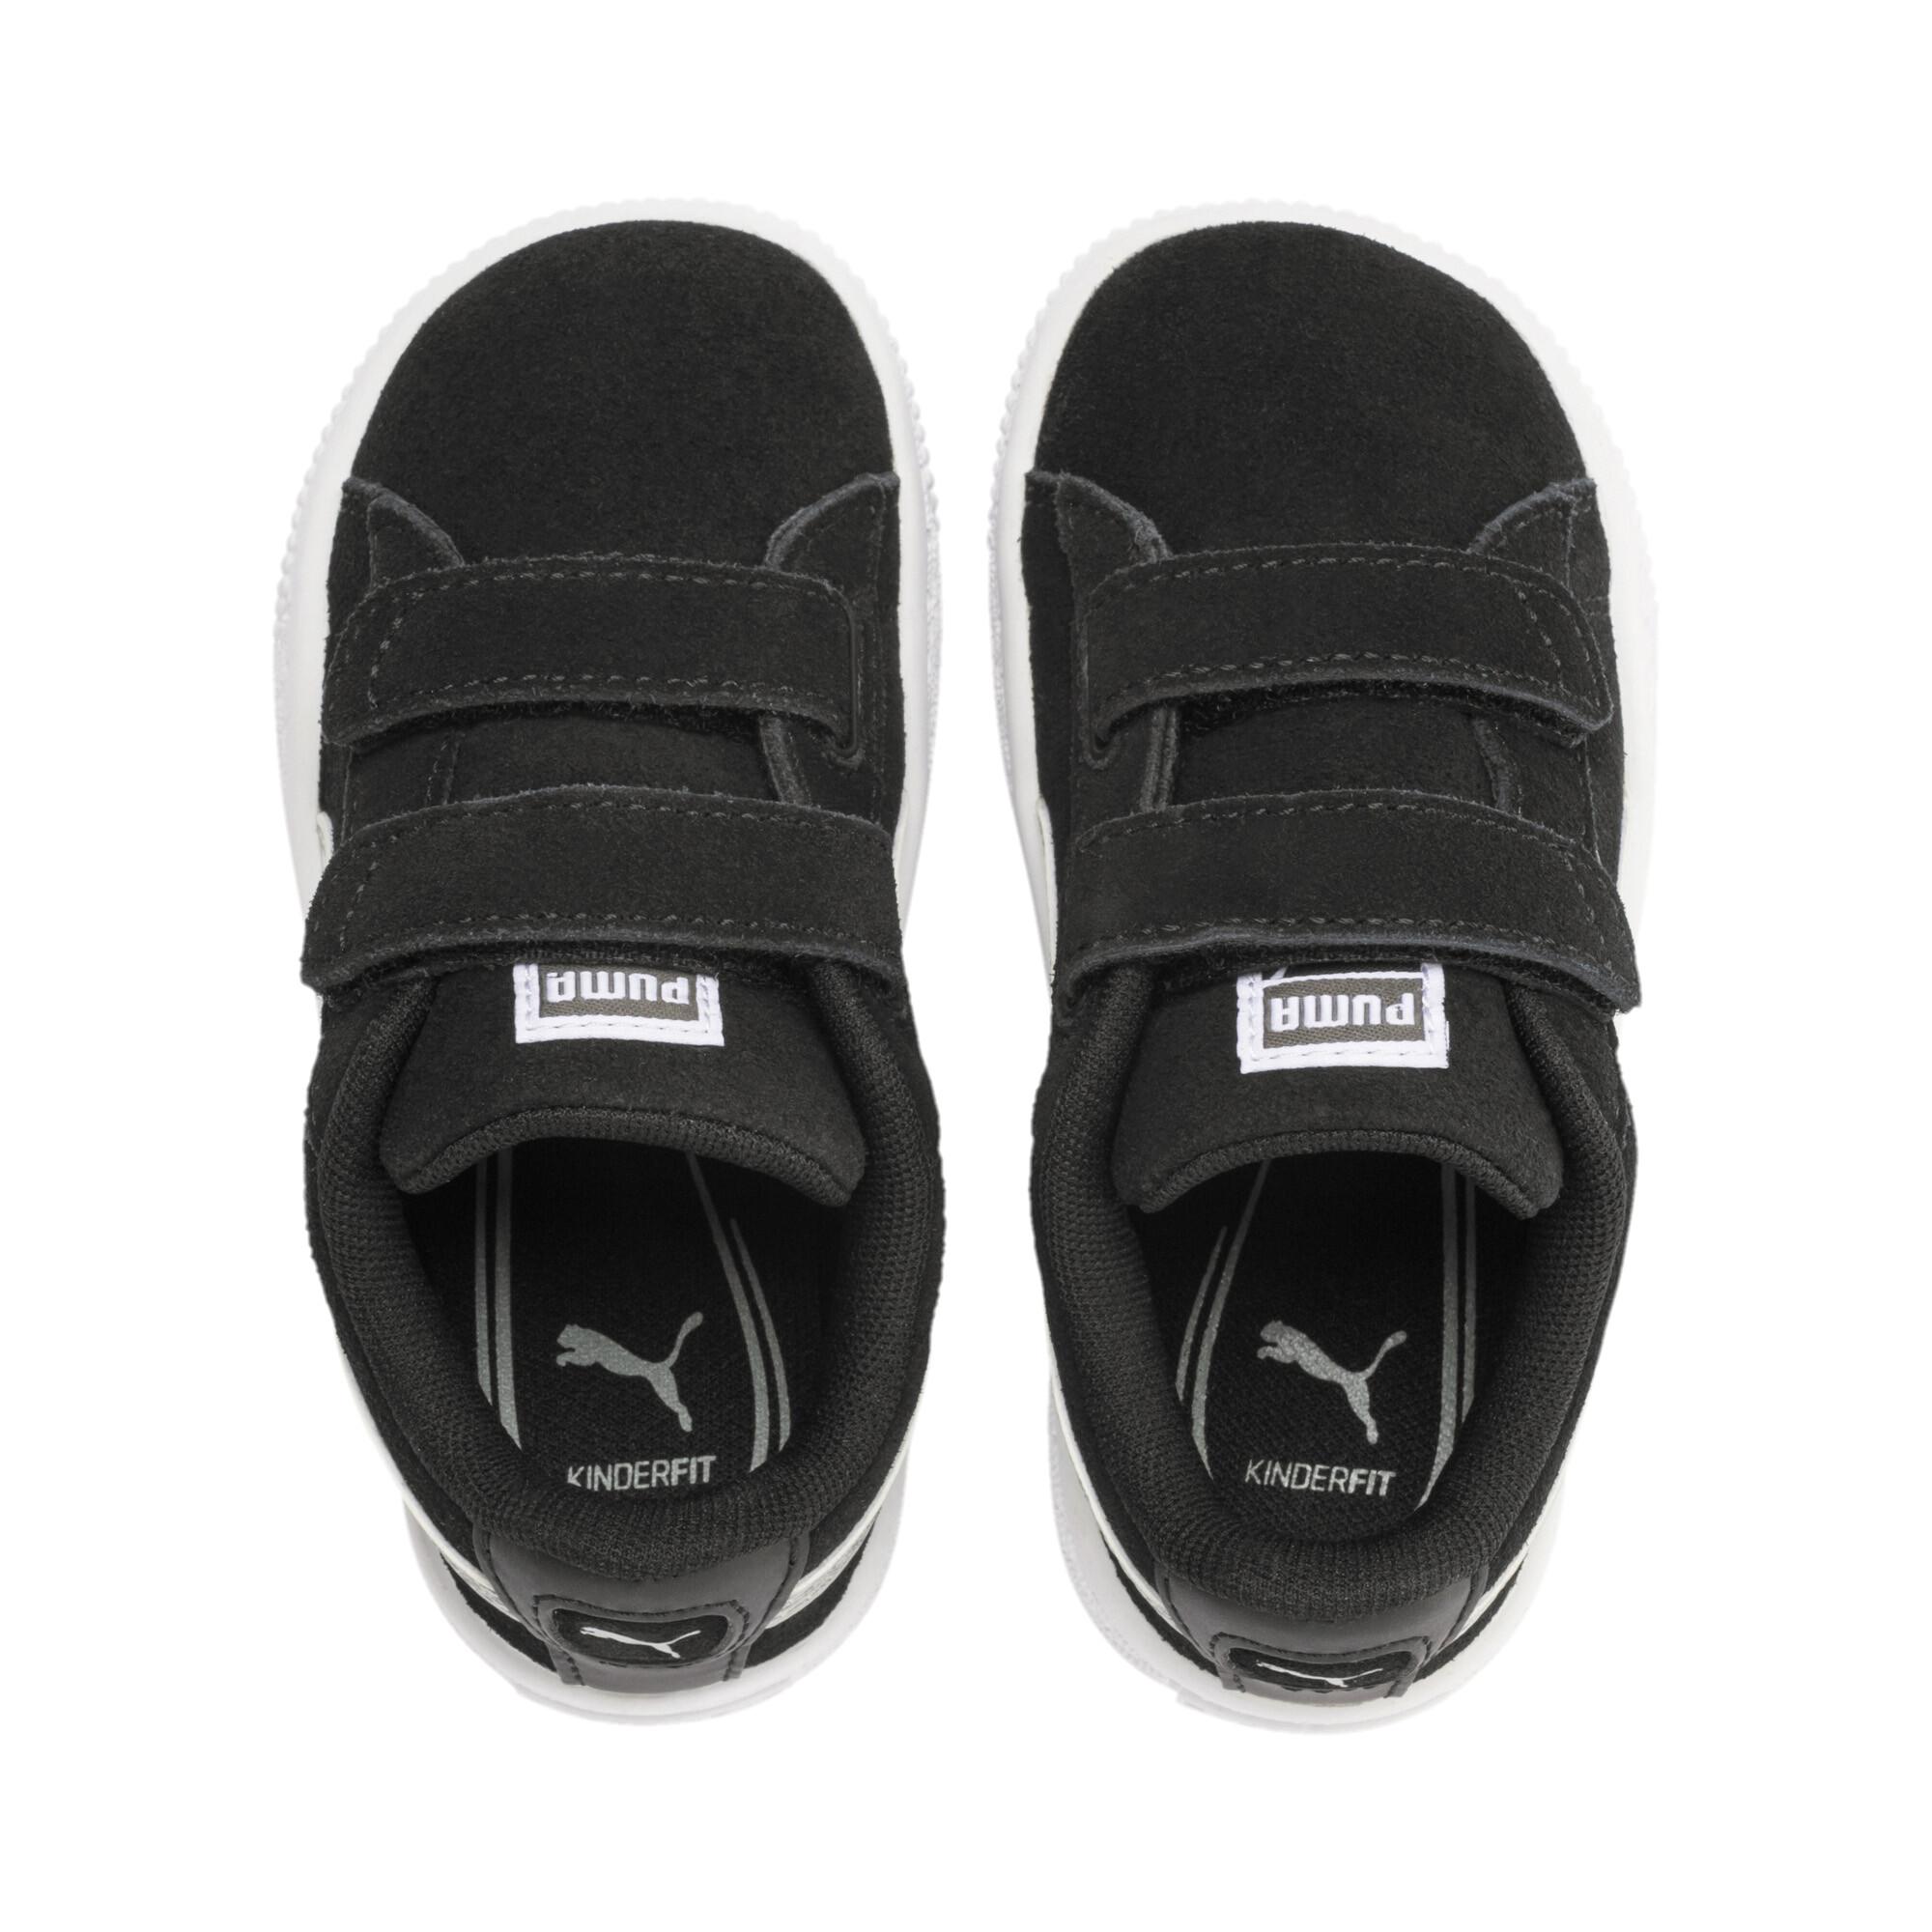 PUMA-Suede-Classic-Lightning-Toddler-Shoes-Boys-Shoe-Kids thumbnail 7